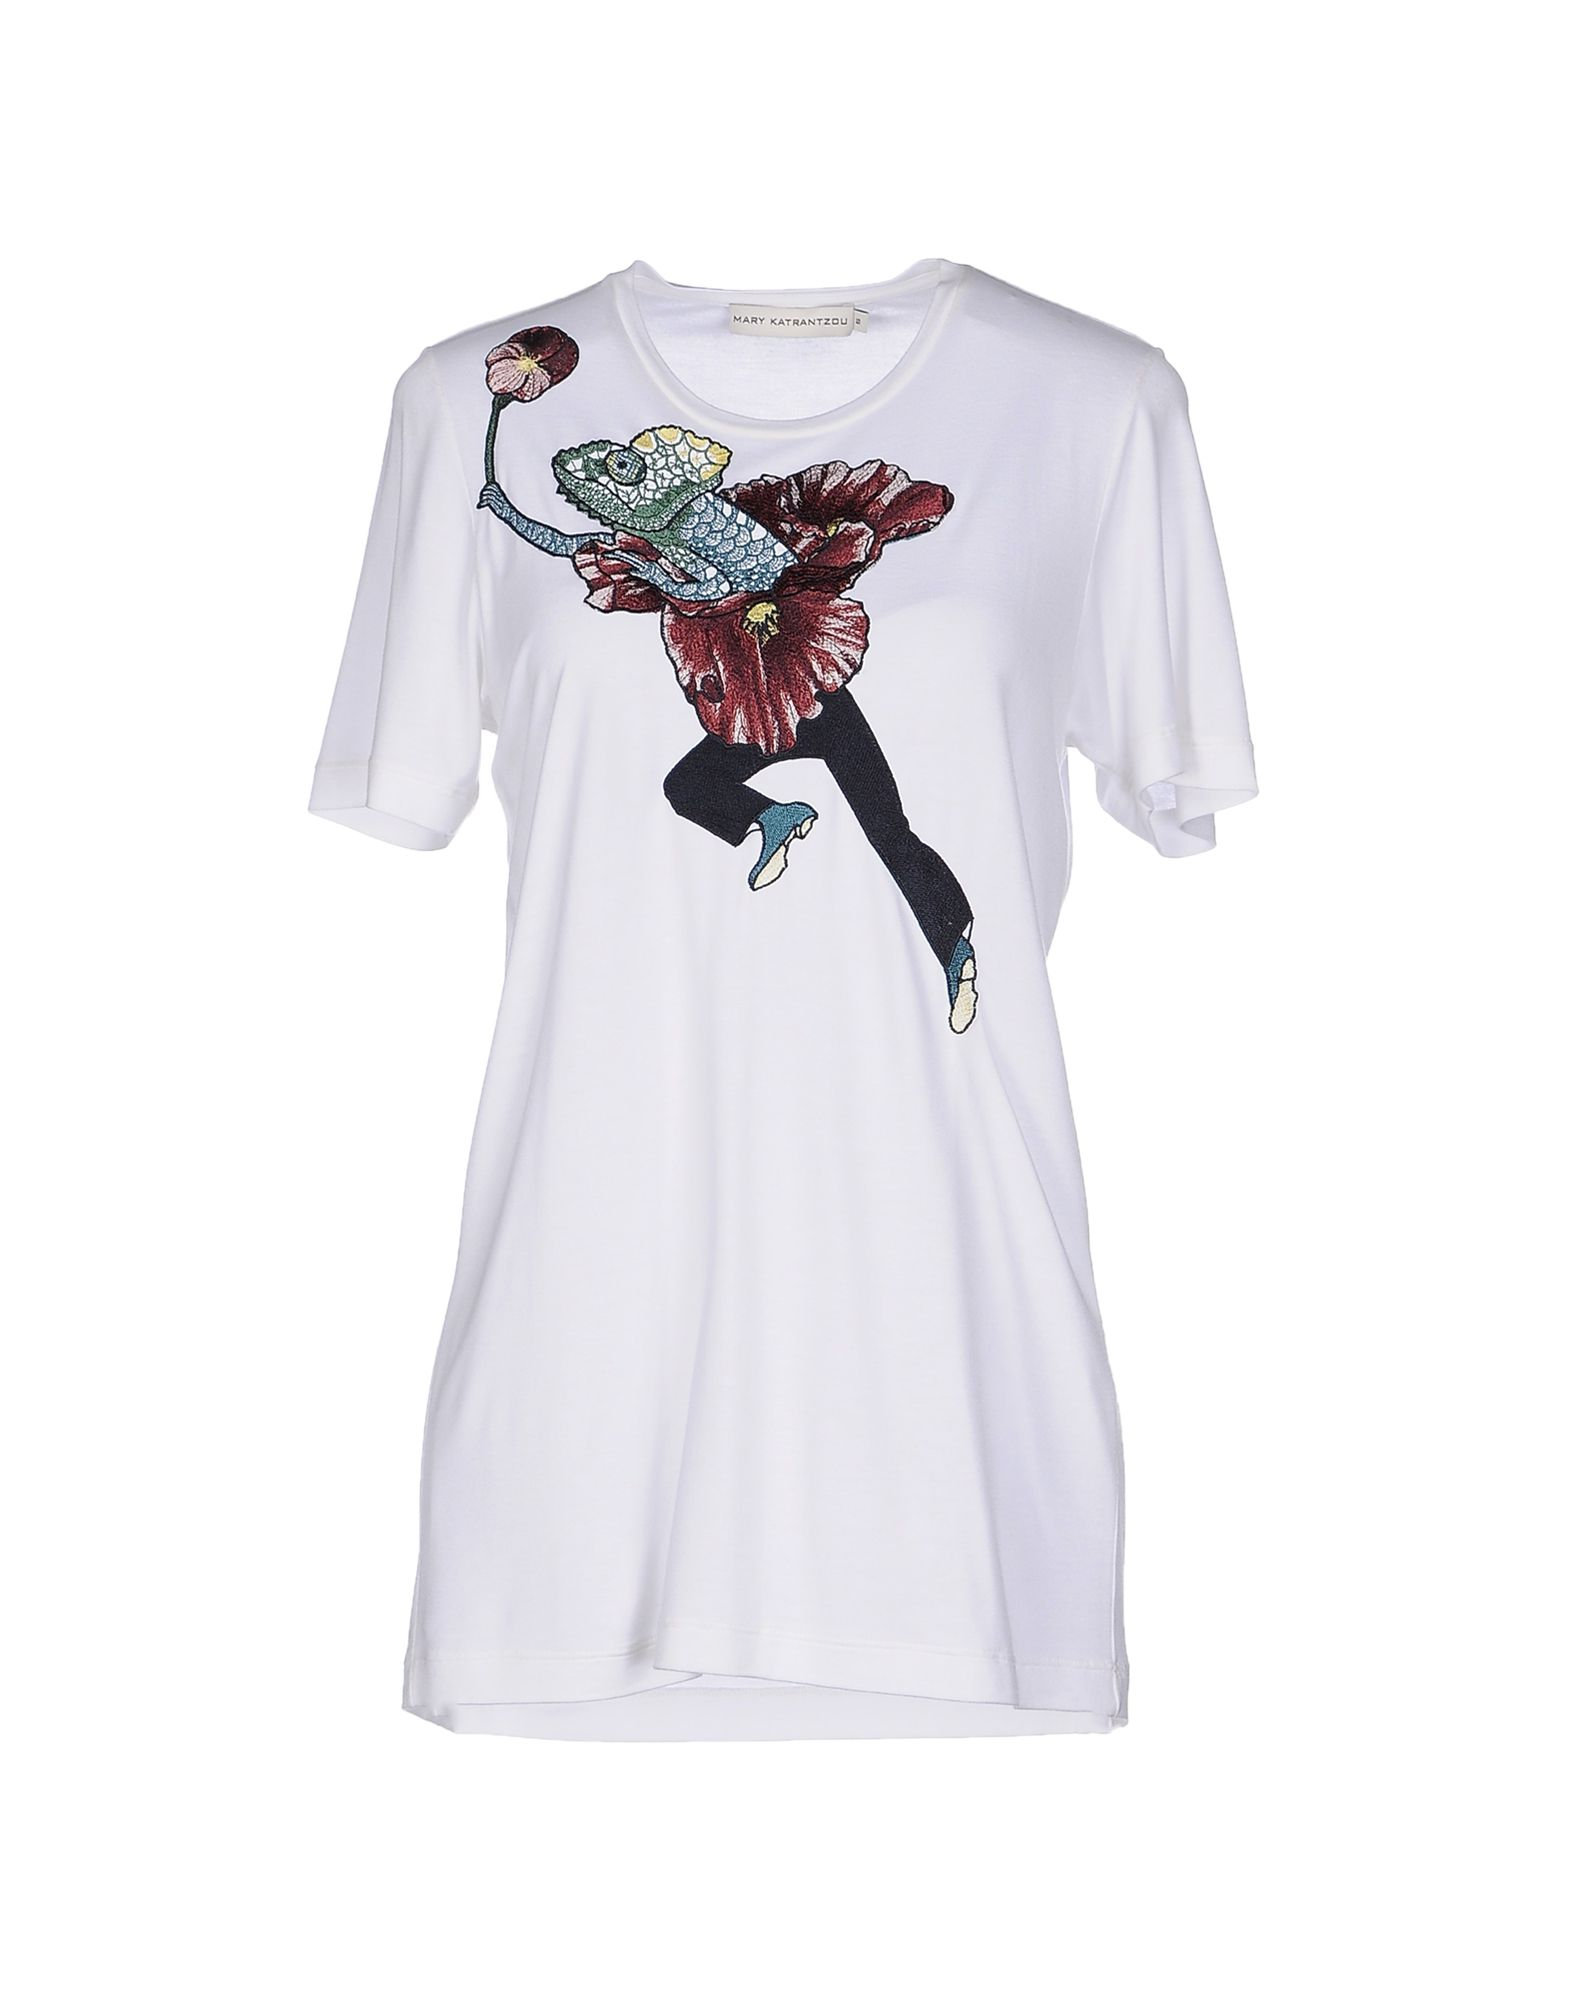 T-Shirt Mary Katrantzou Donna - Acquista online su